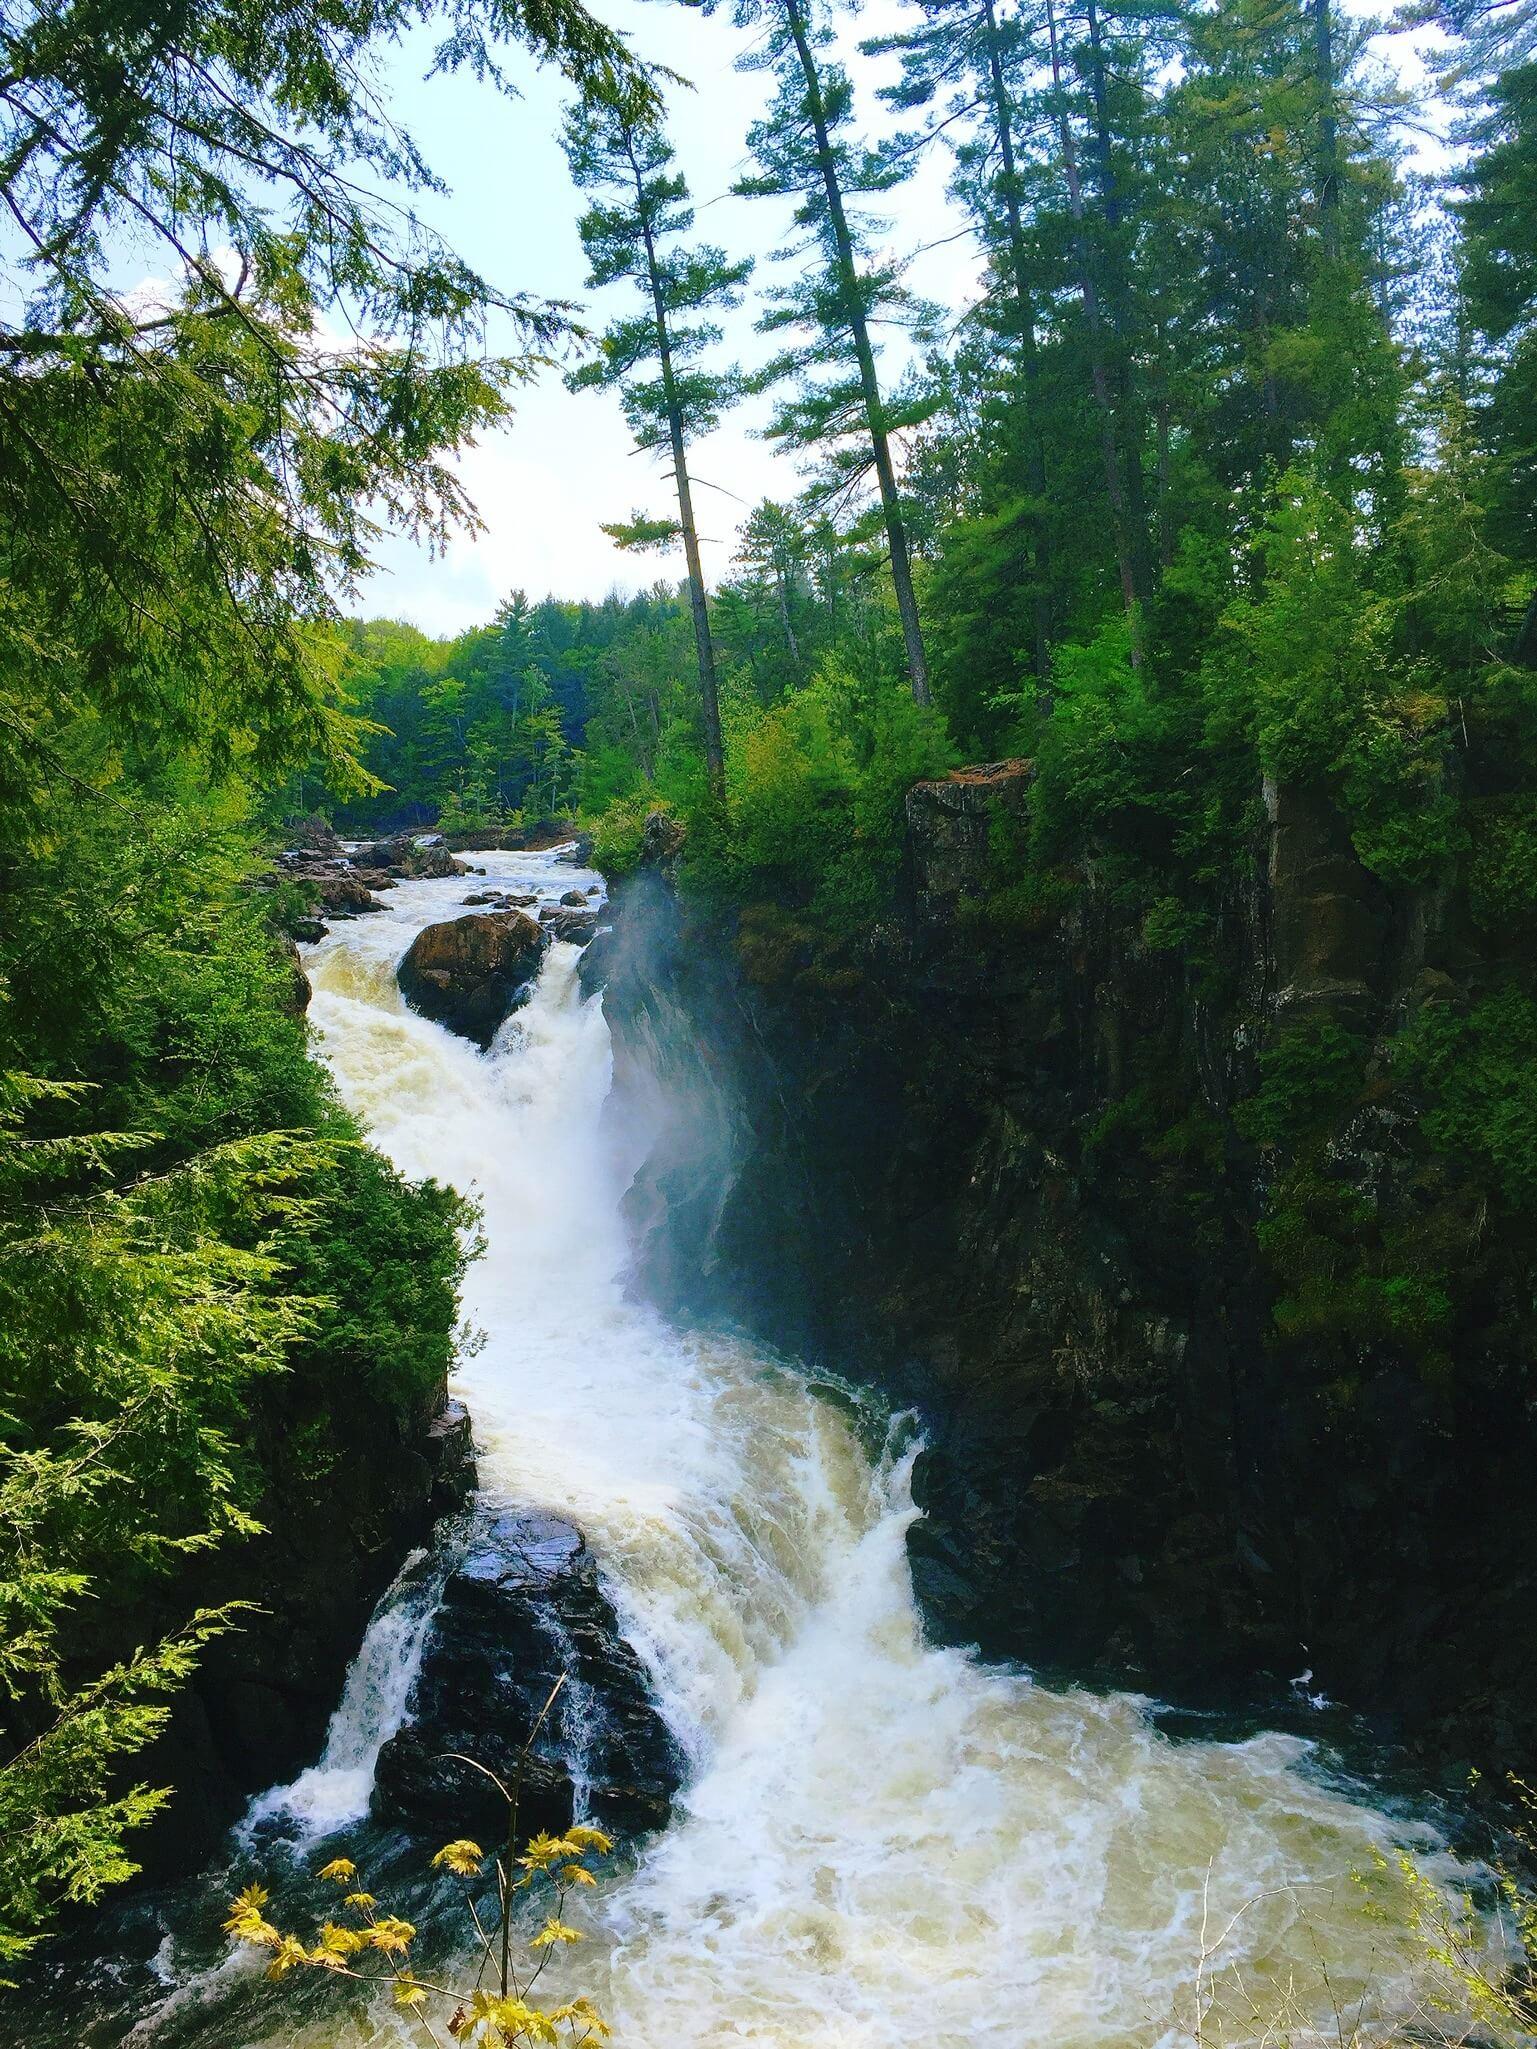 Escaping the ordinary at Dorwin Falls